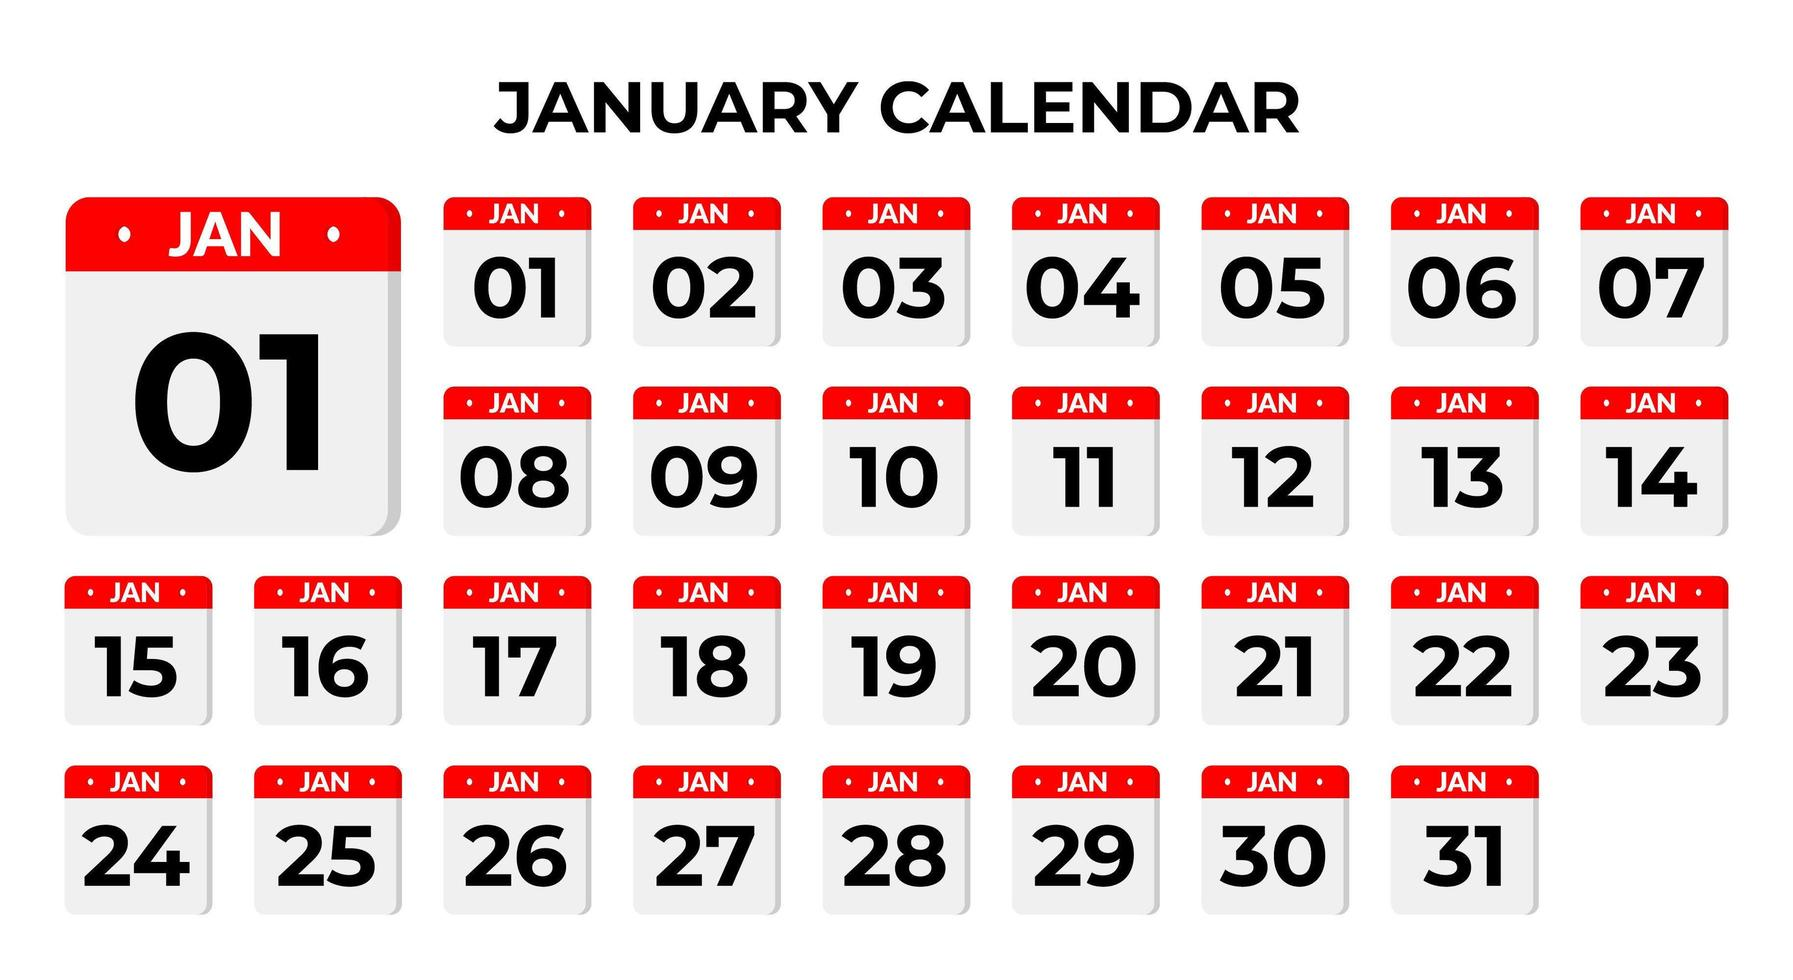 januari kalender ikoner vektor